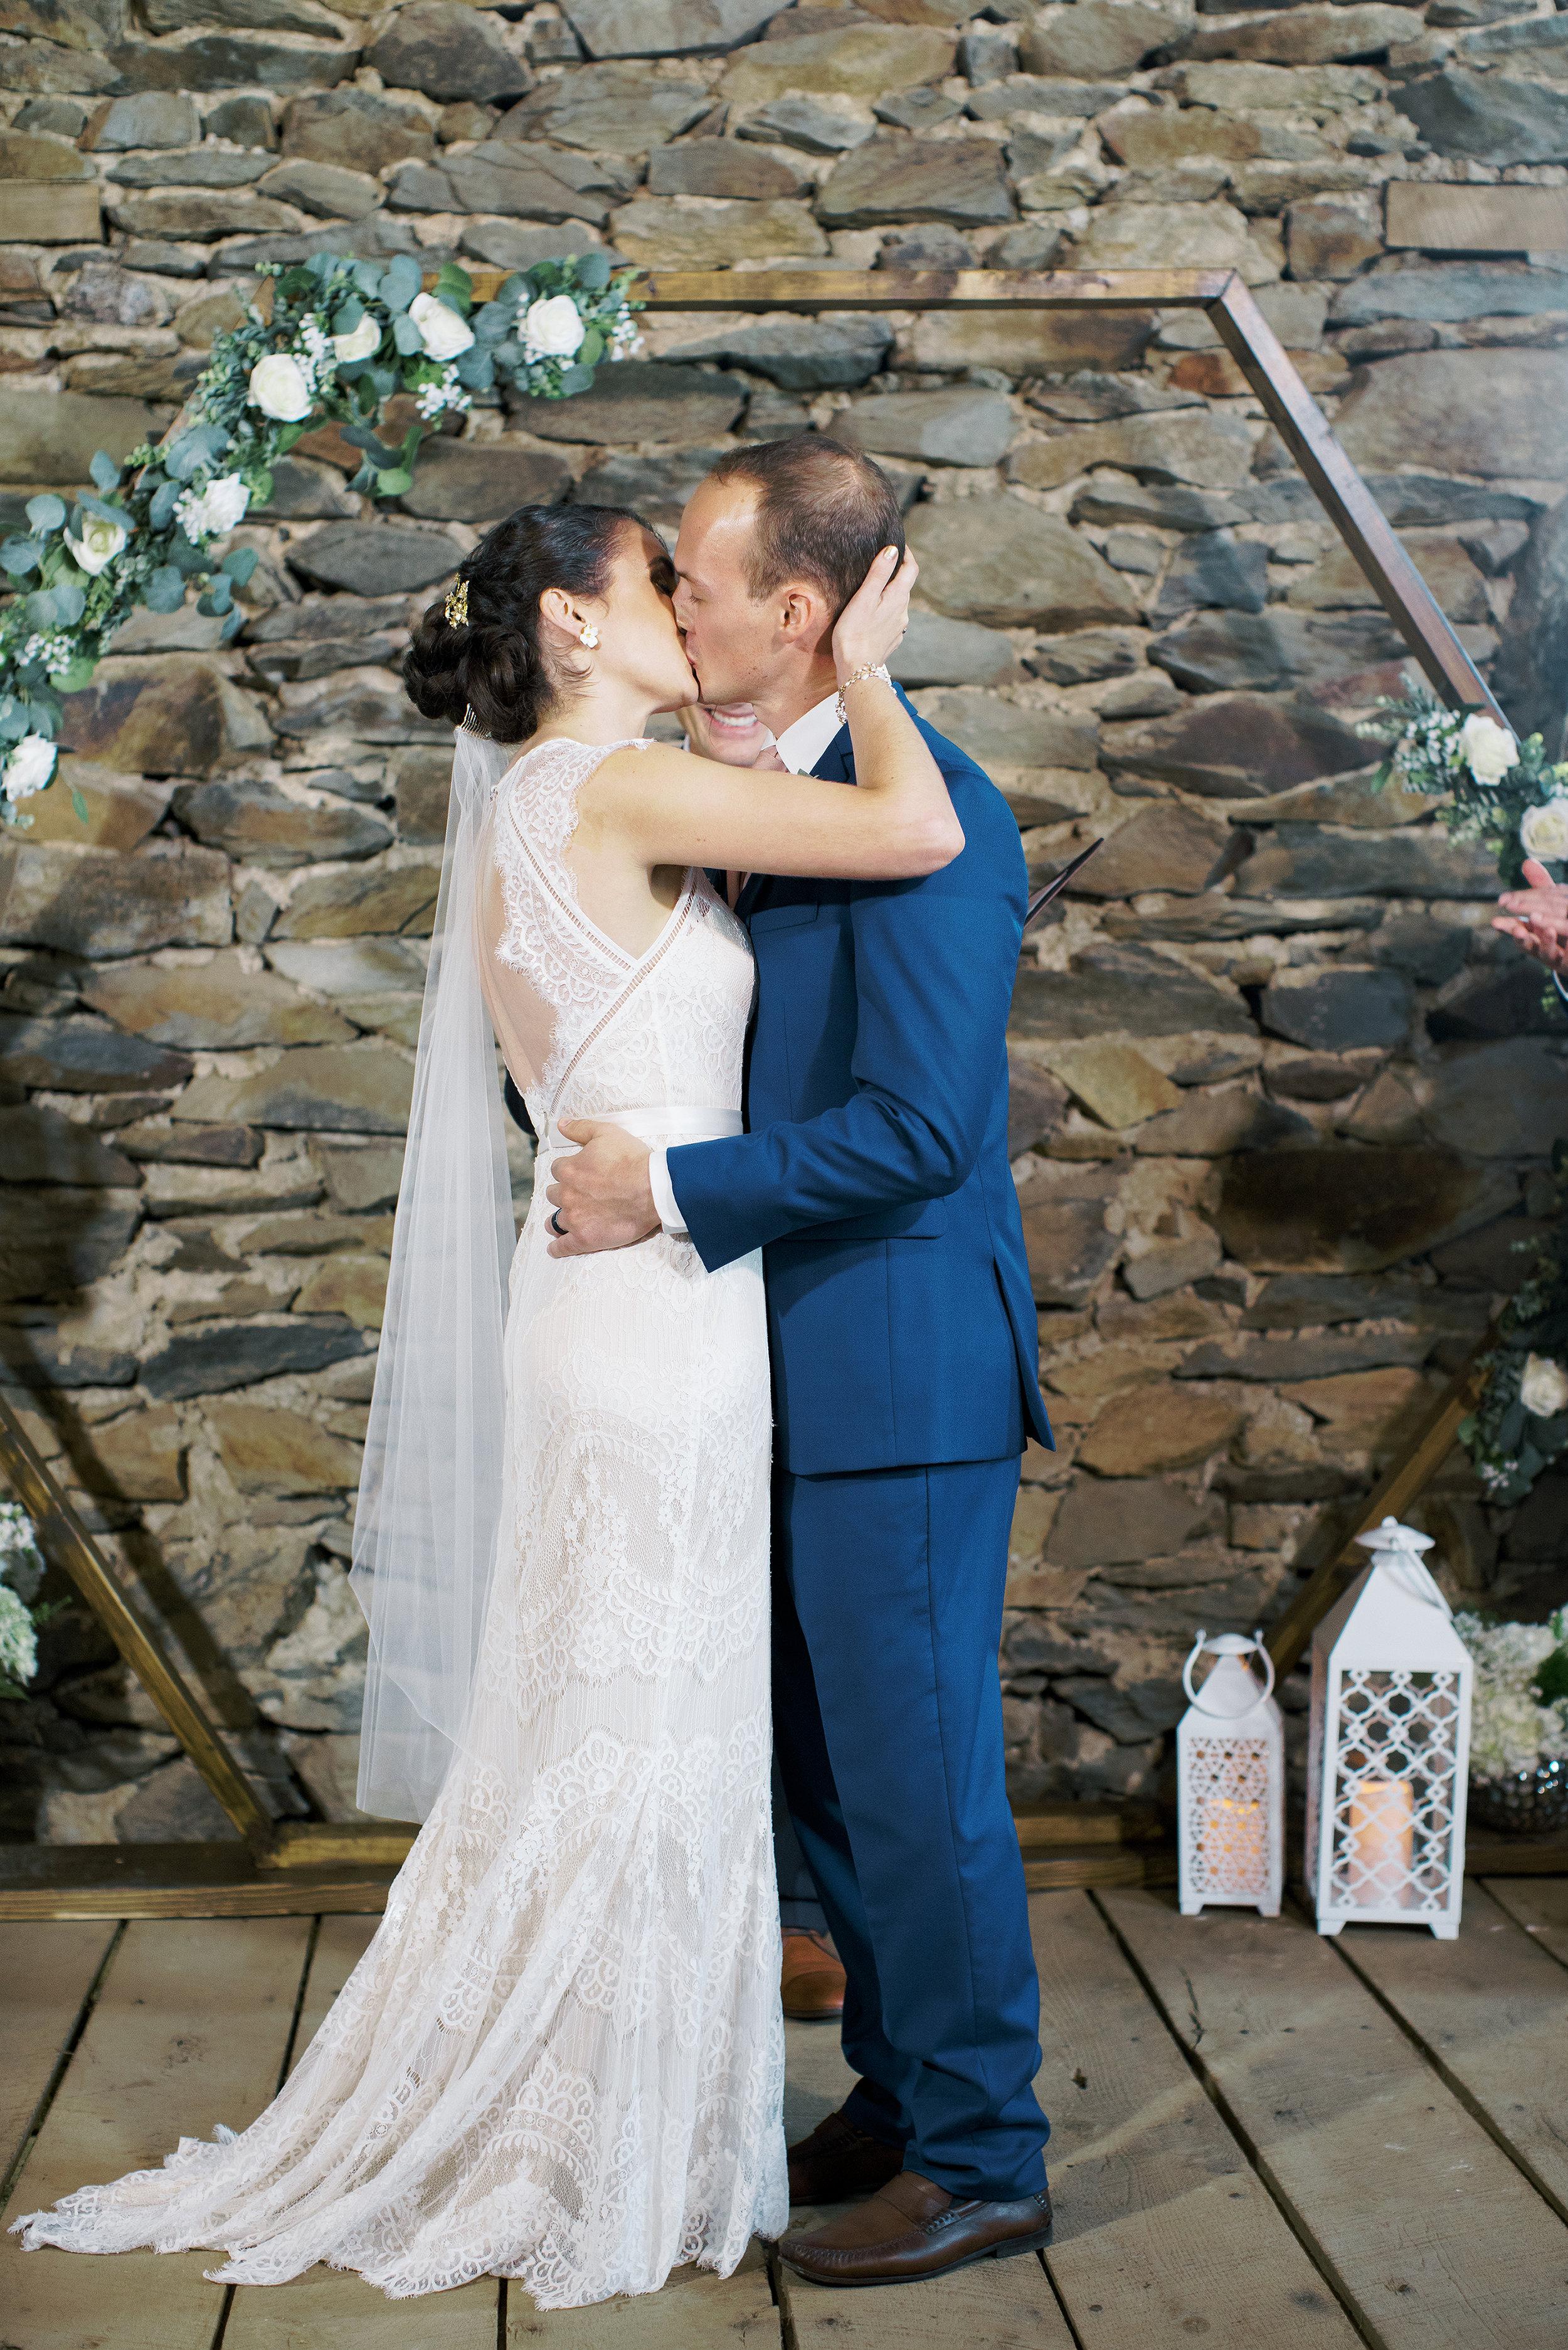 Vicki_Grafton_Photography_wedding-358.jpg